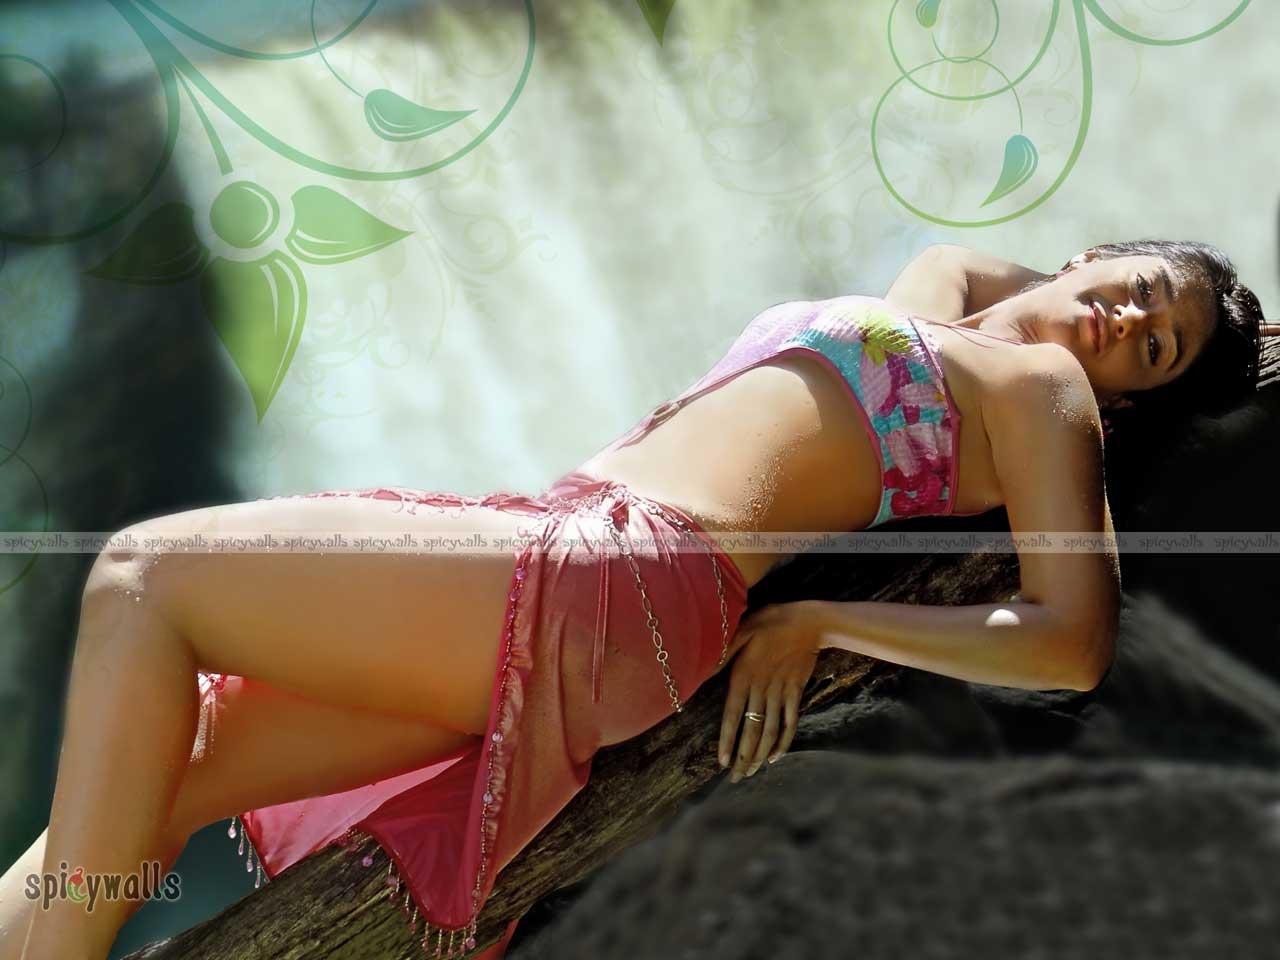 http://2.bp.blogspot.com/-0aU_zRnqi94/UFTU_yibApI/AAAAAAAADVk/5_GXuc1cFoQ/s1600/Ileana_Bikini_Picture.jpg